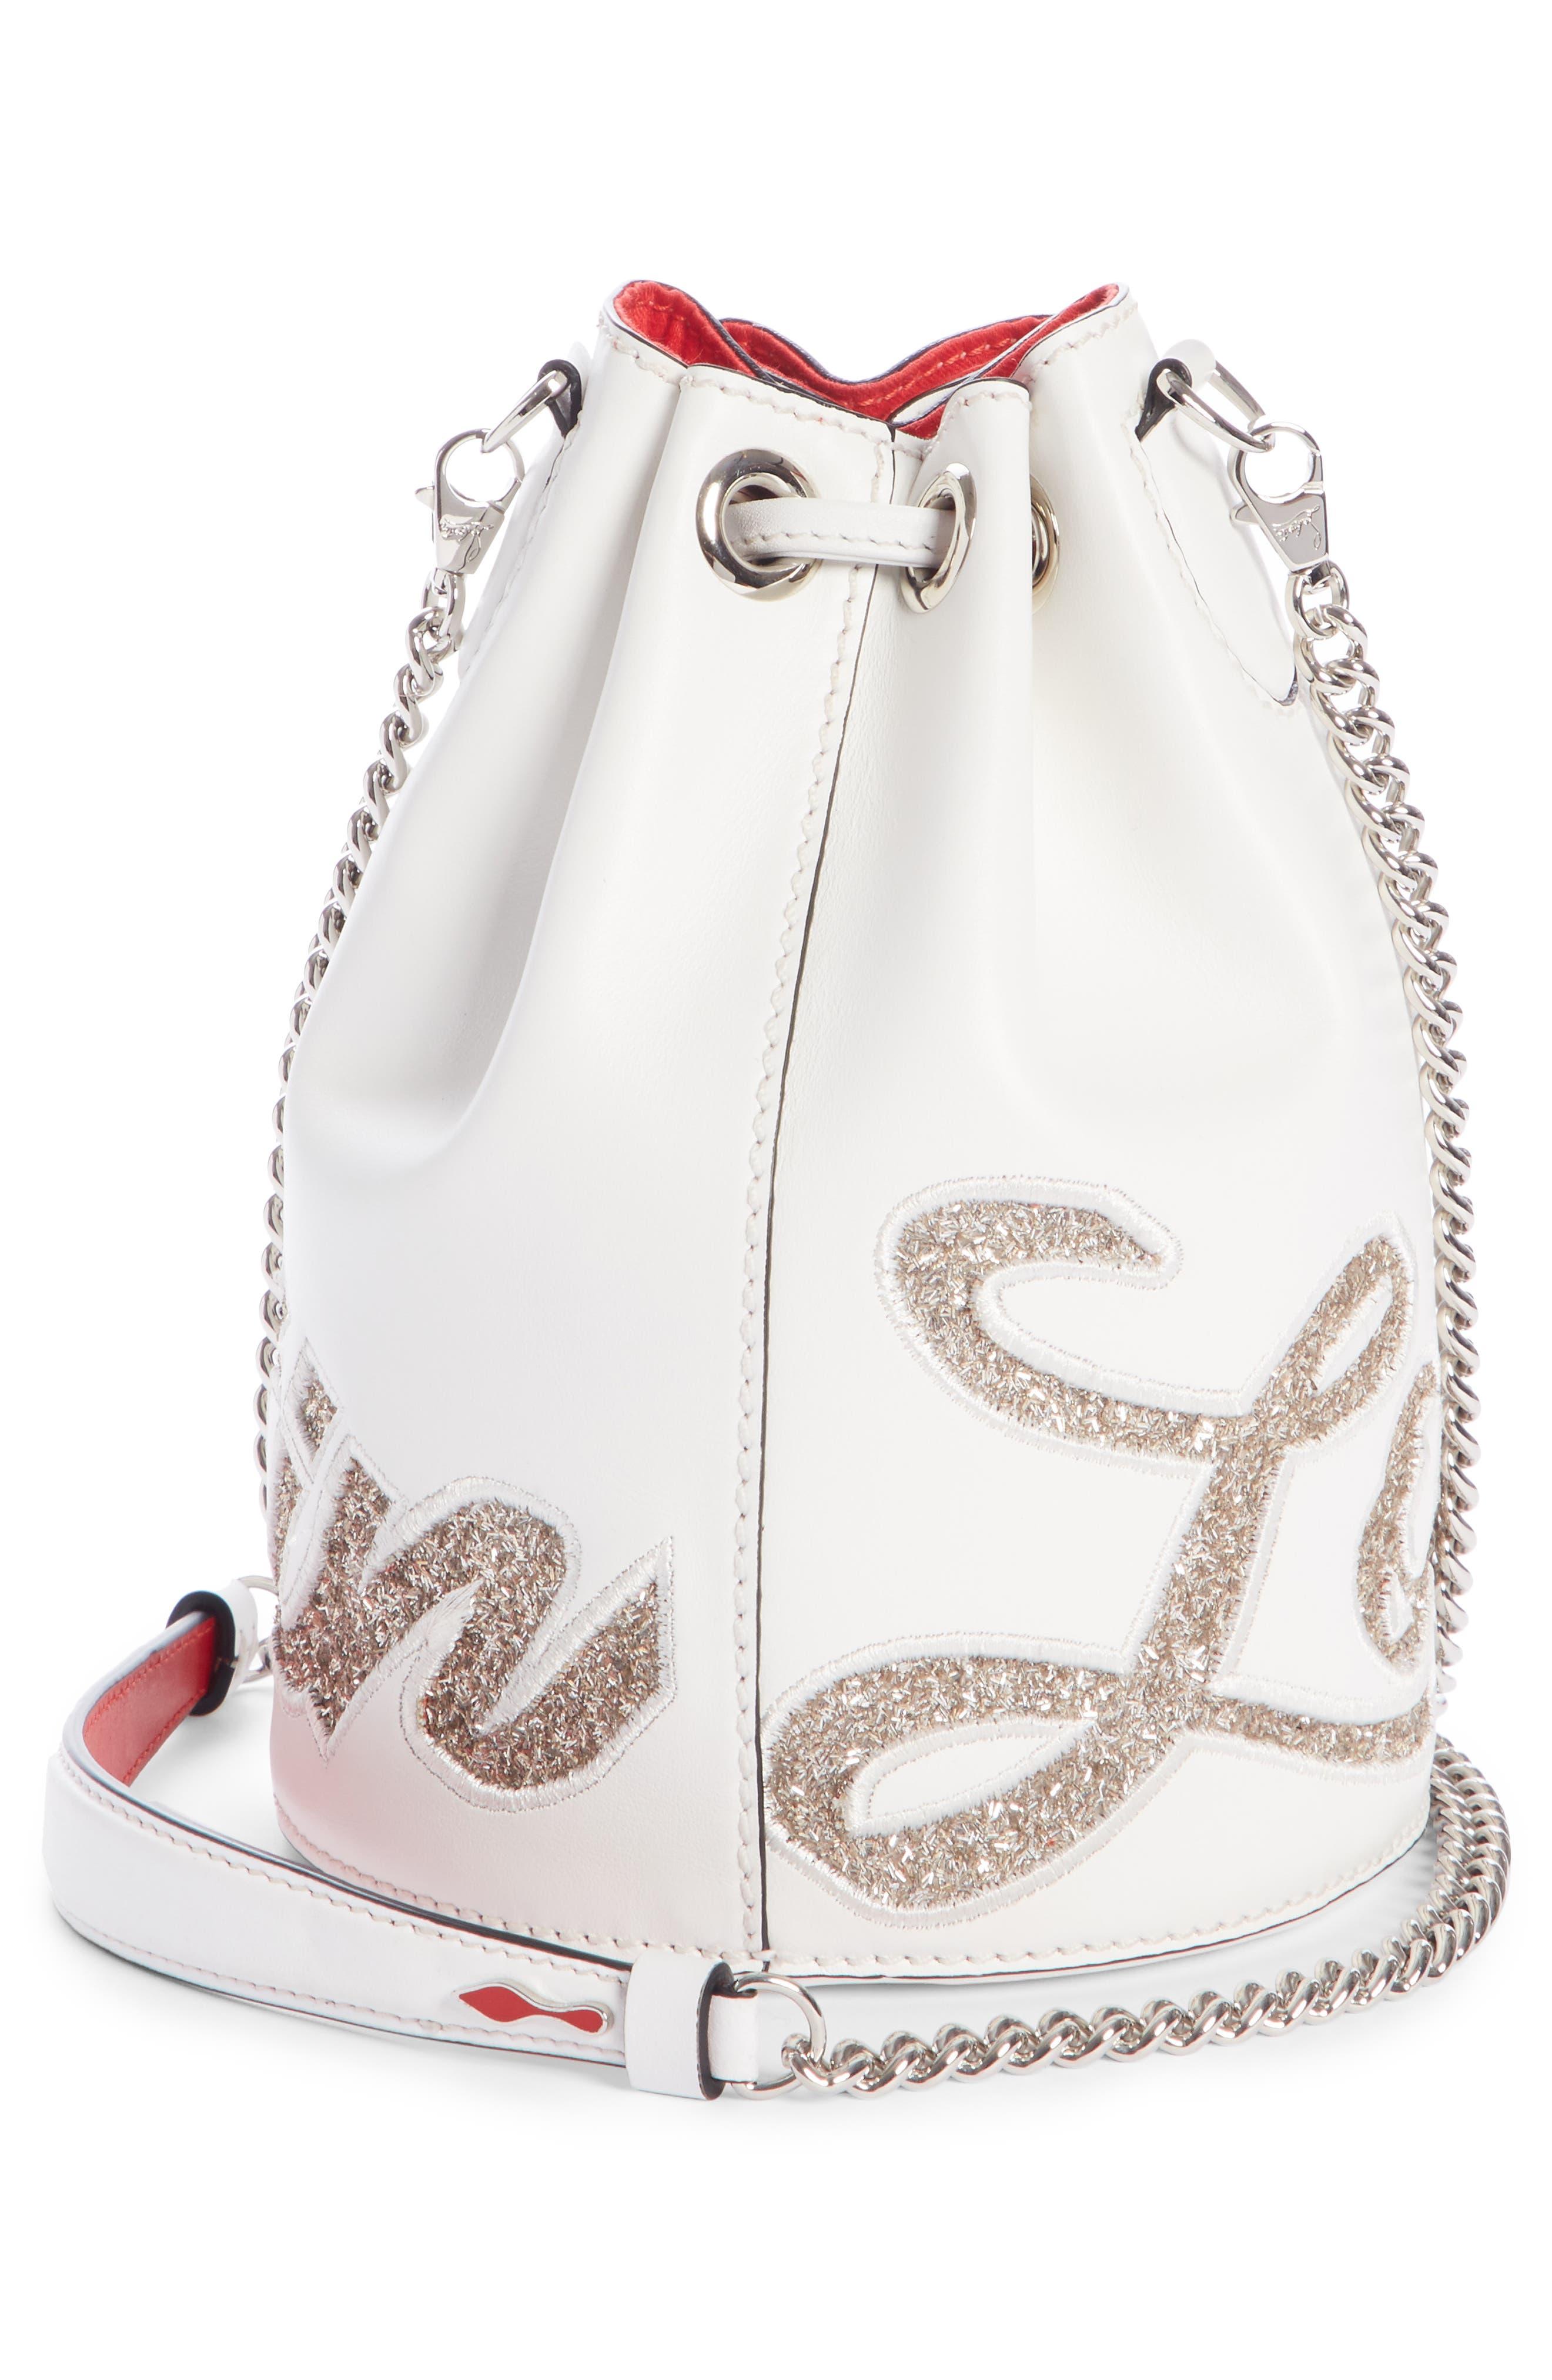 Marie Jane Calfskin Bucket Bag,                             Alternate thumbnail 3, color,                             SNOW/ PERLE